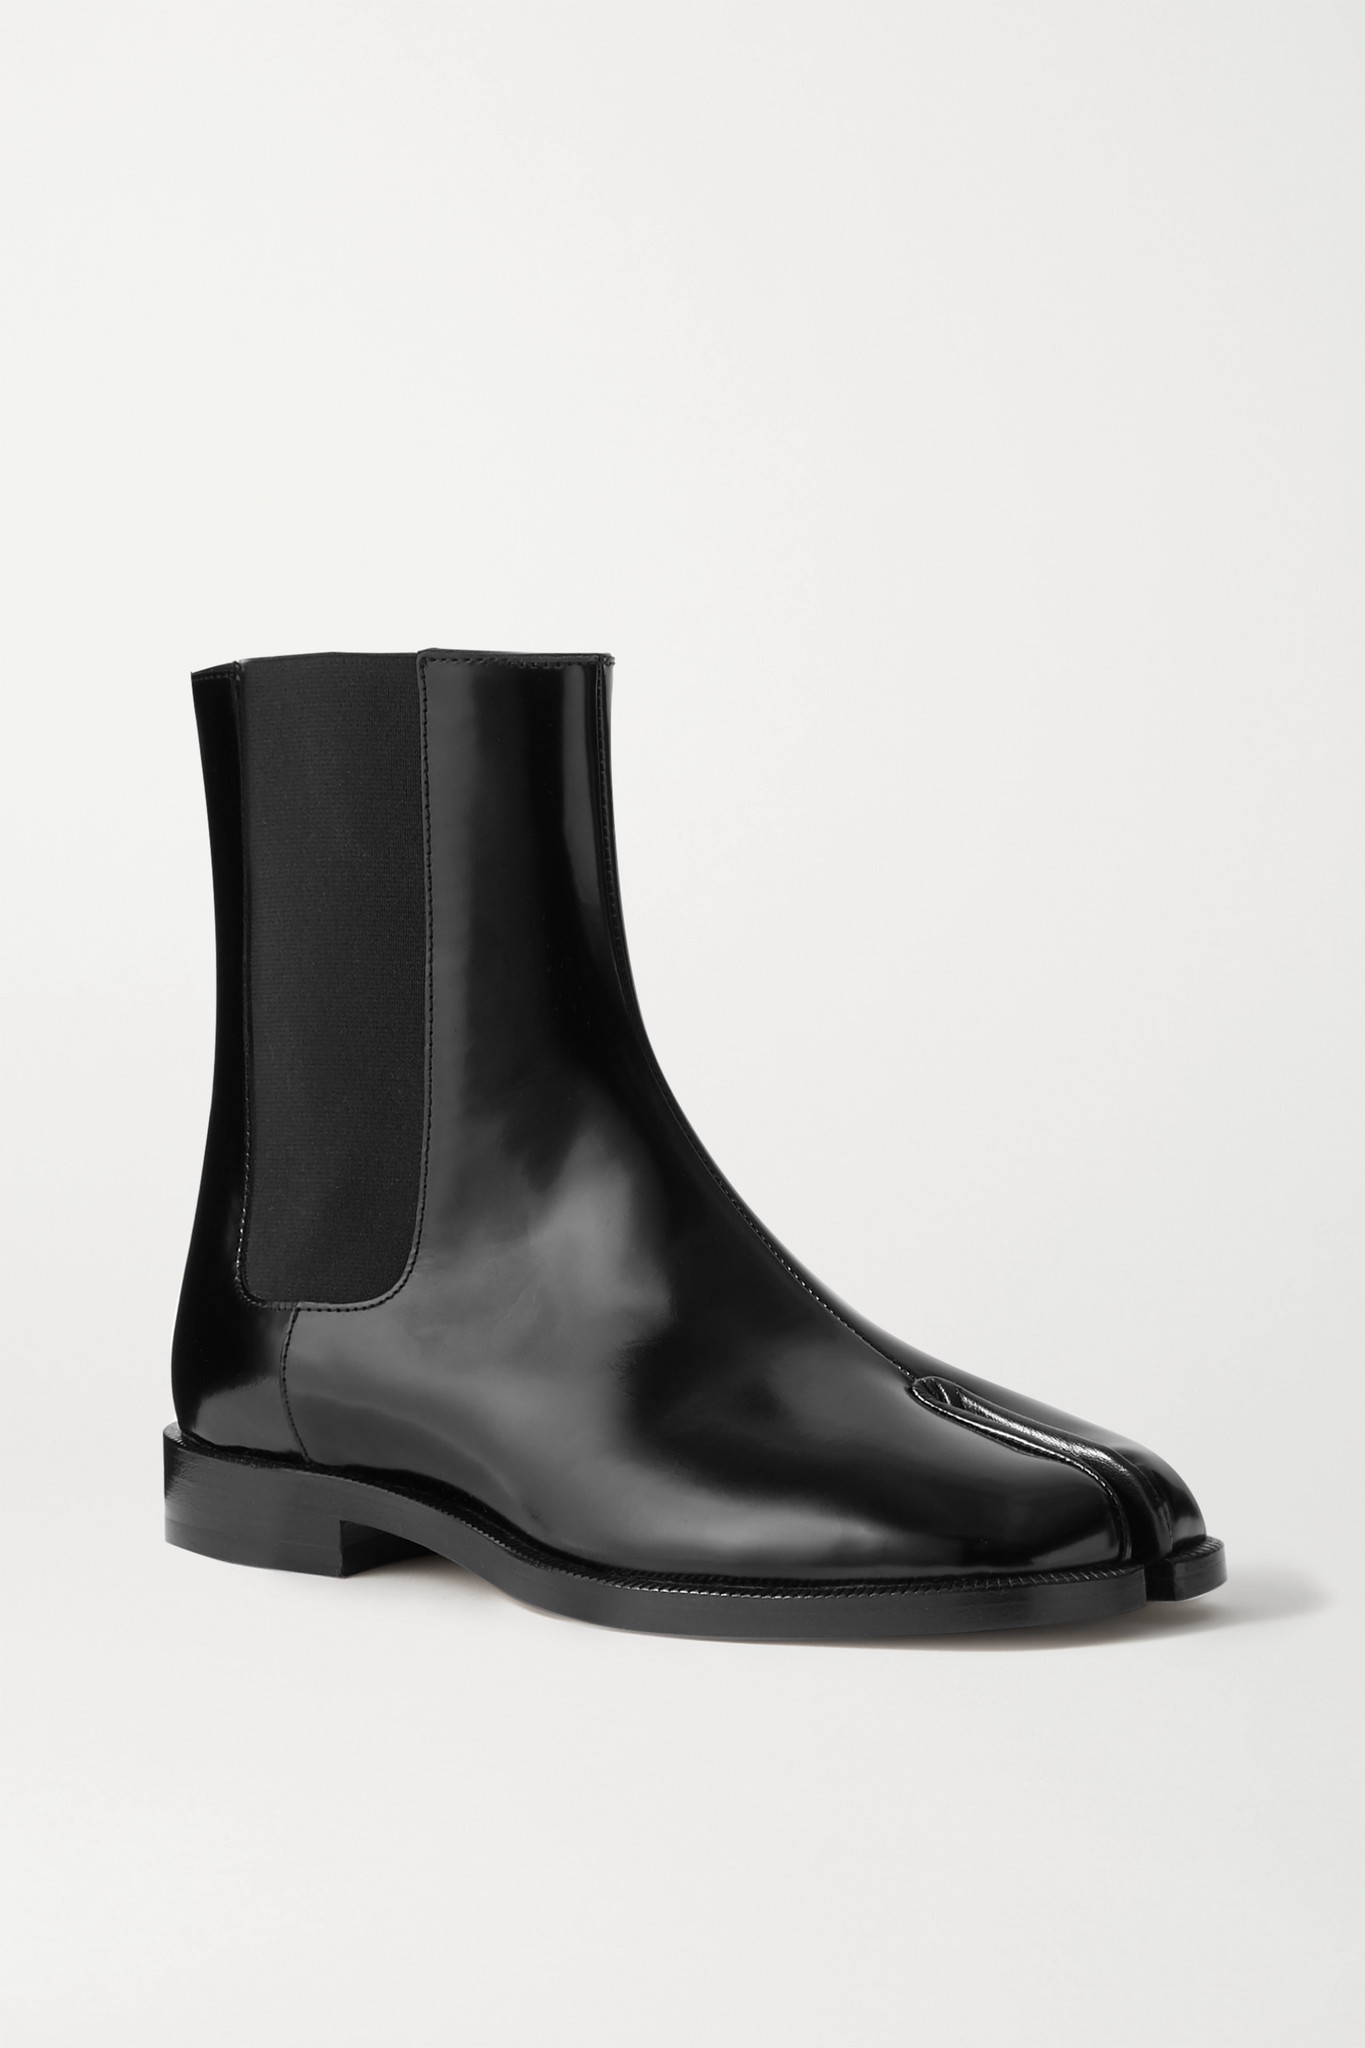 MAISON MARGIELA - Tabi 分趾漆皮切尔西靴 - 黑色 - IT37